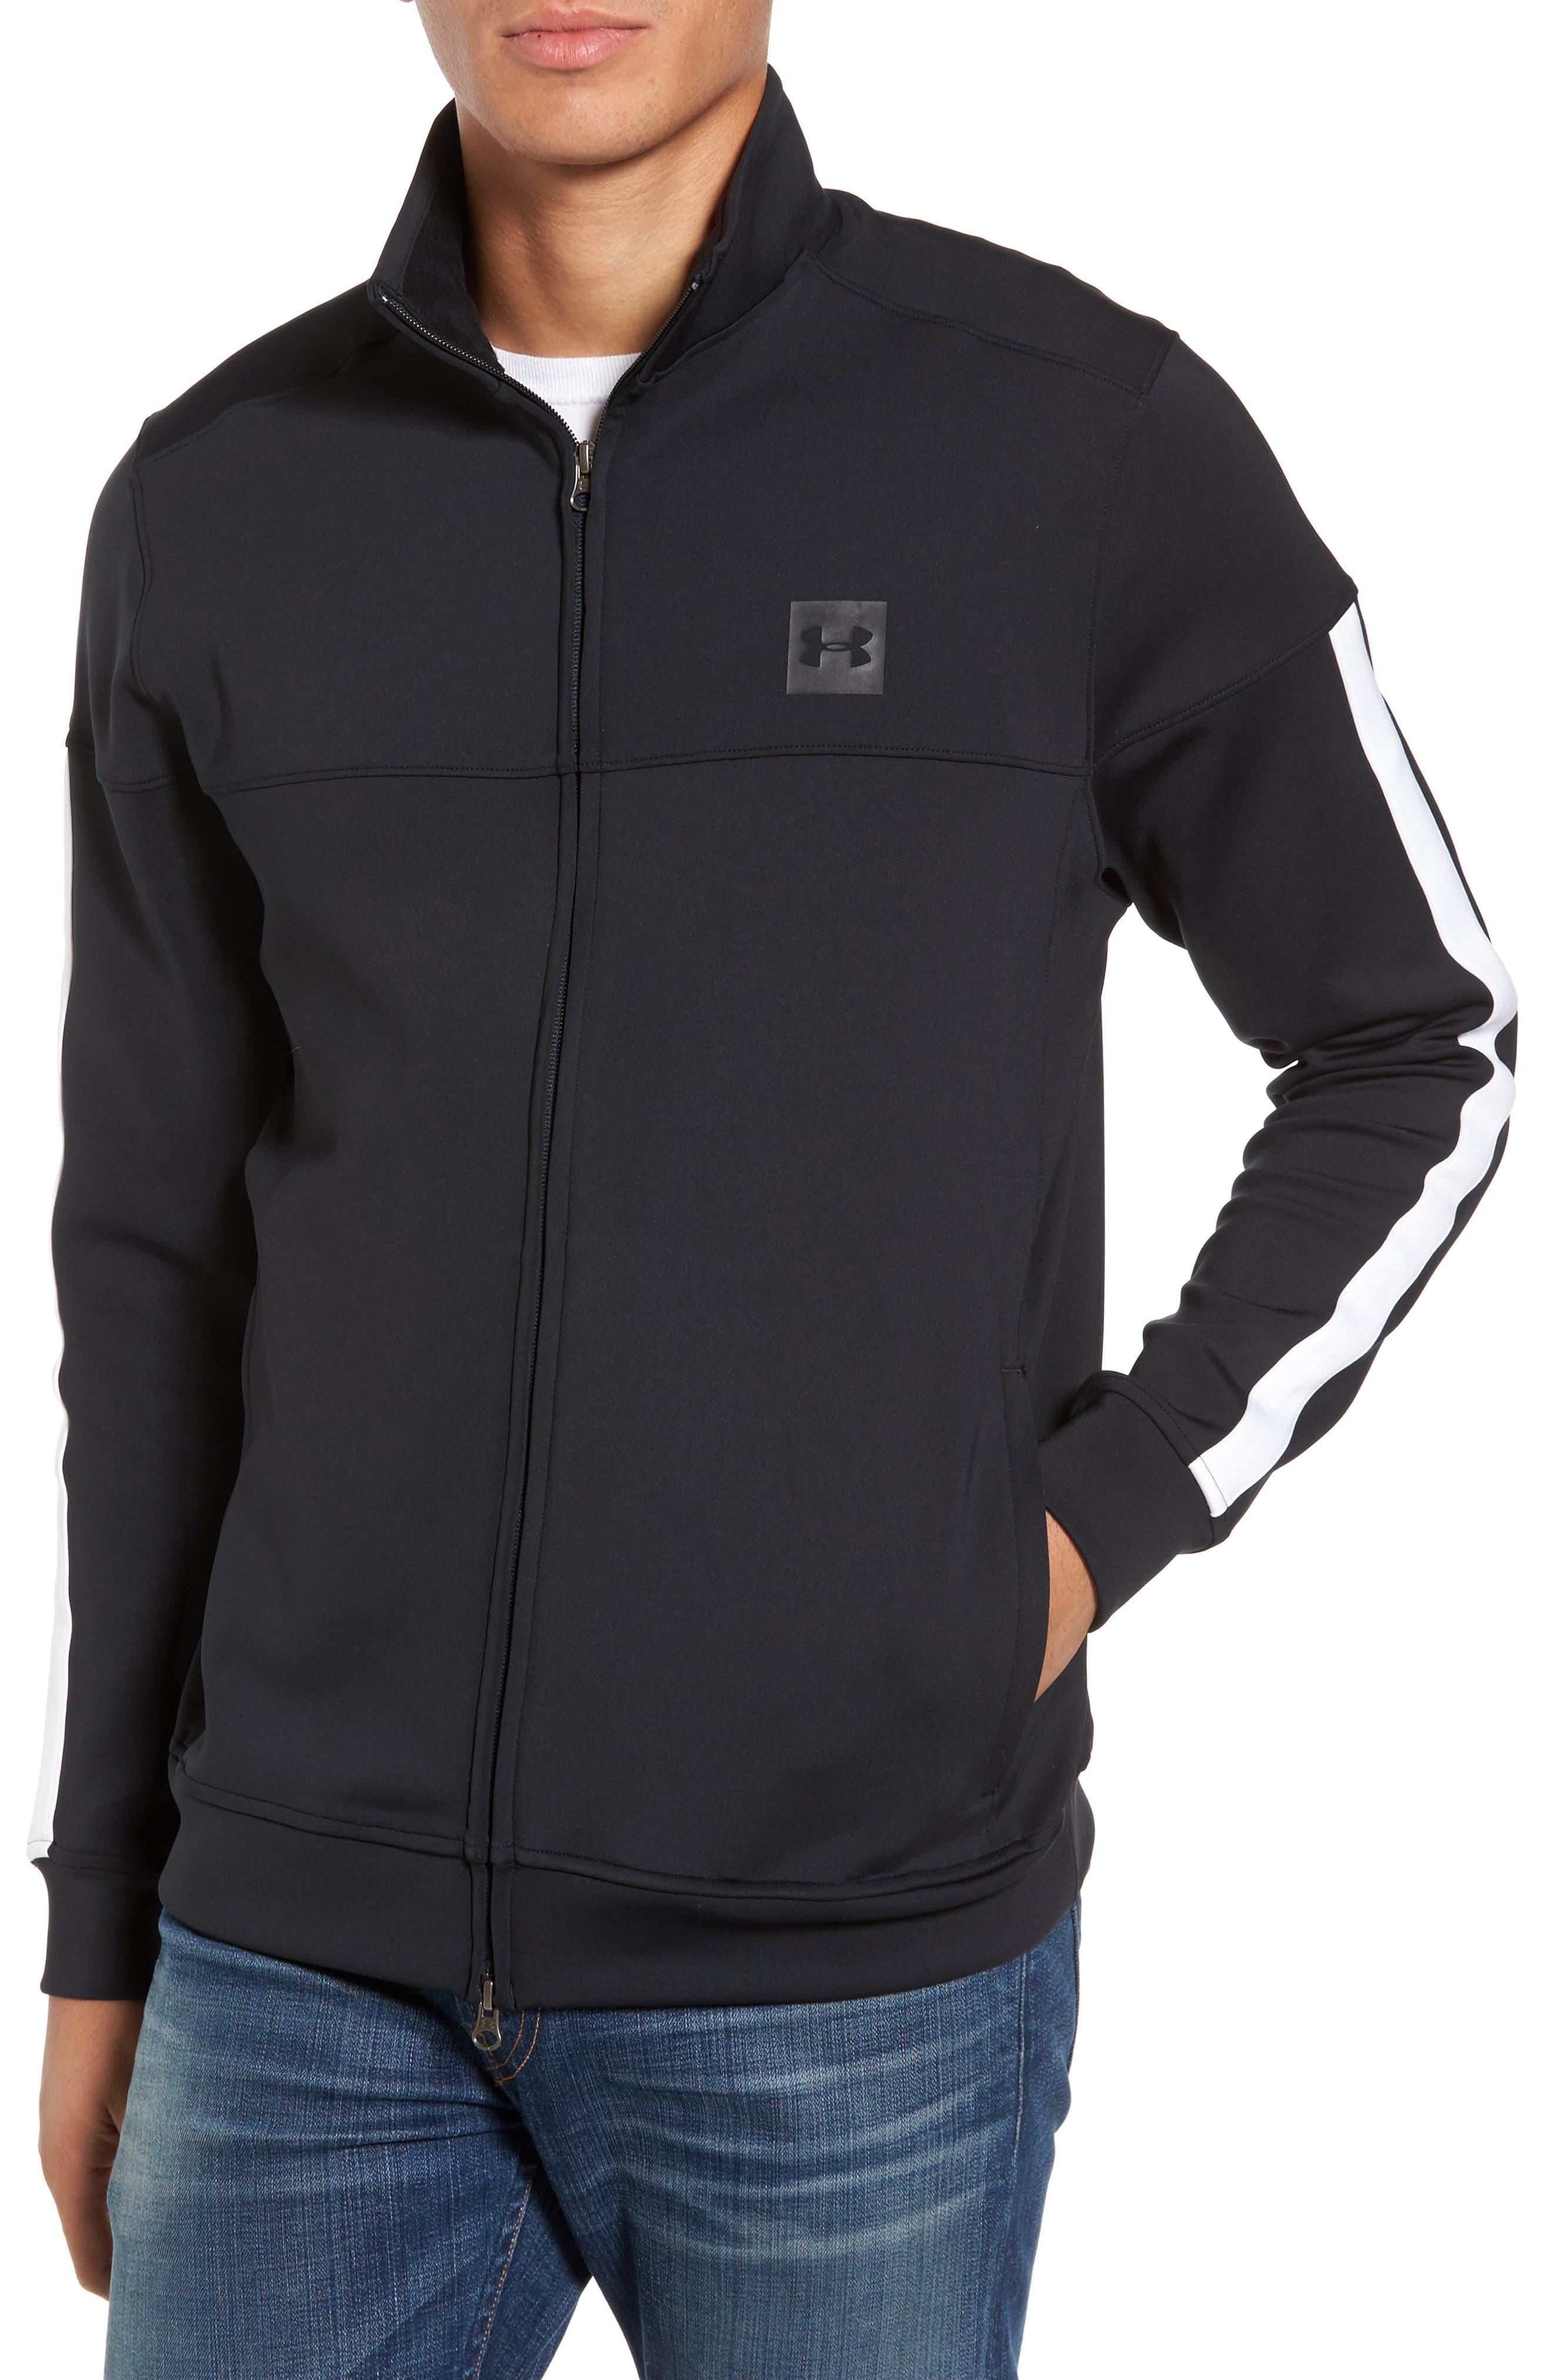 Sportstyle Track Jacket,                         Main,                         color, Black / / Black